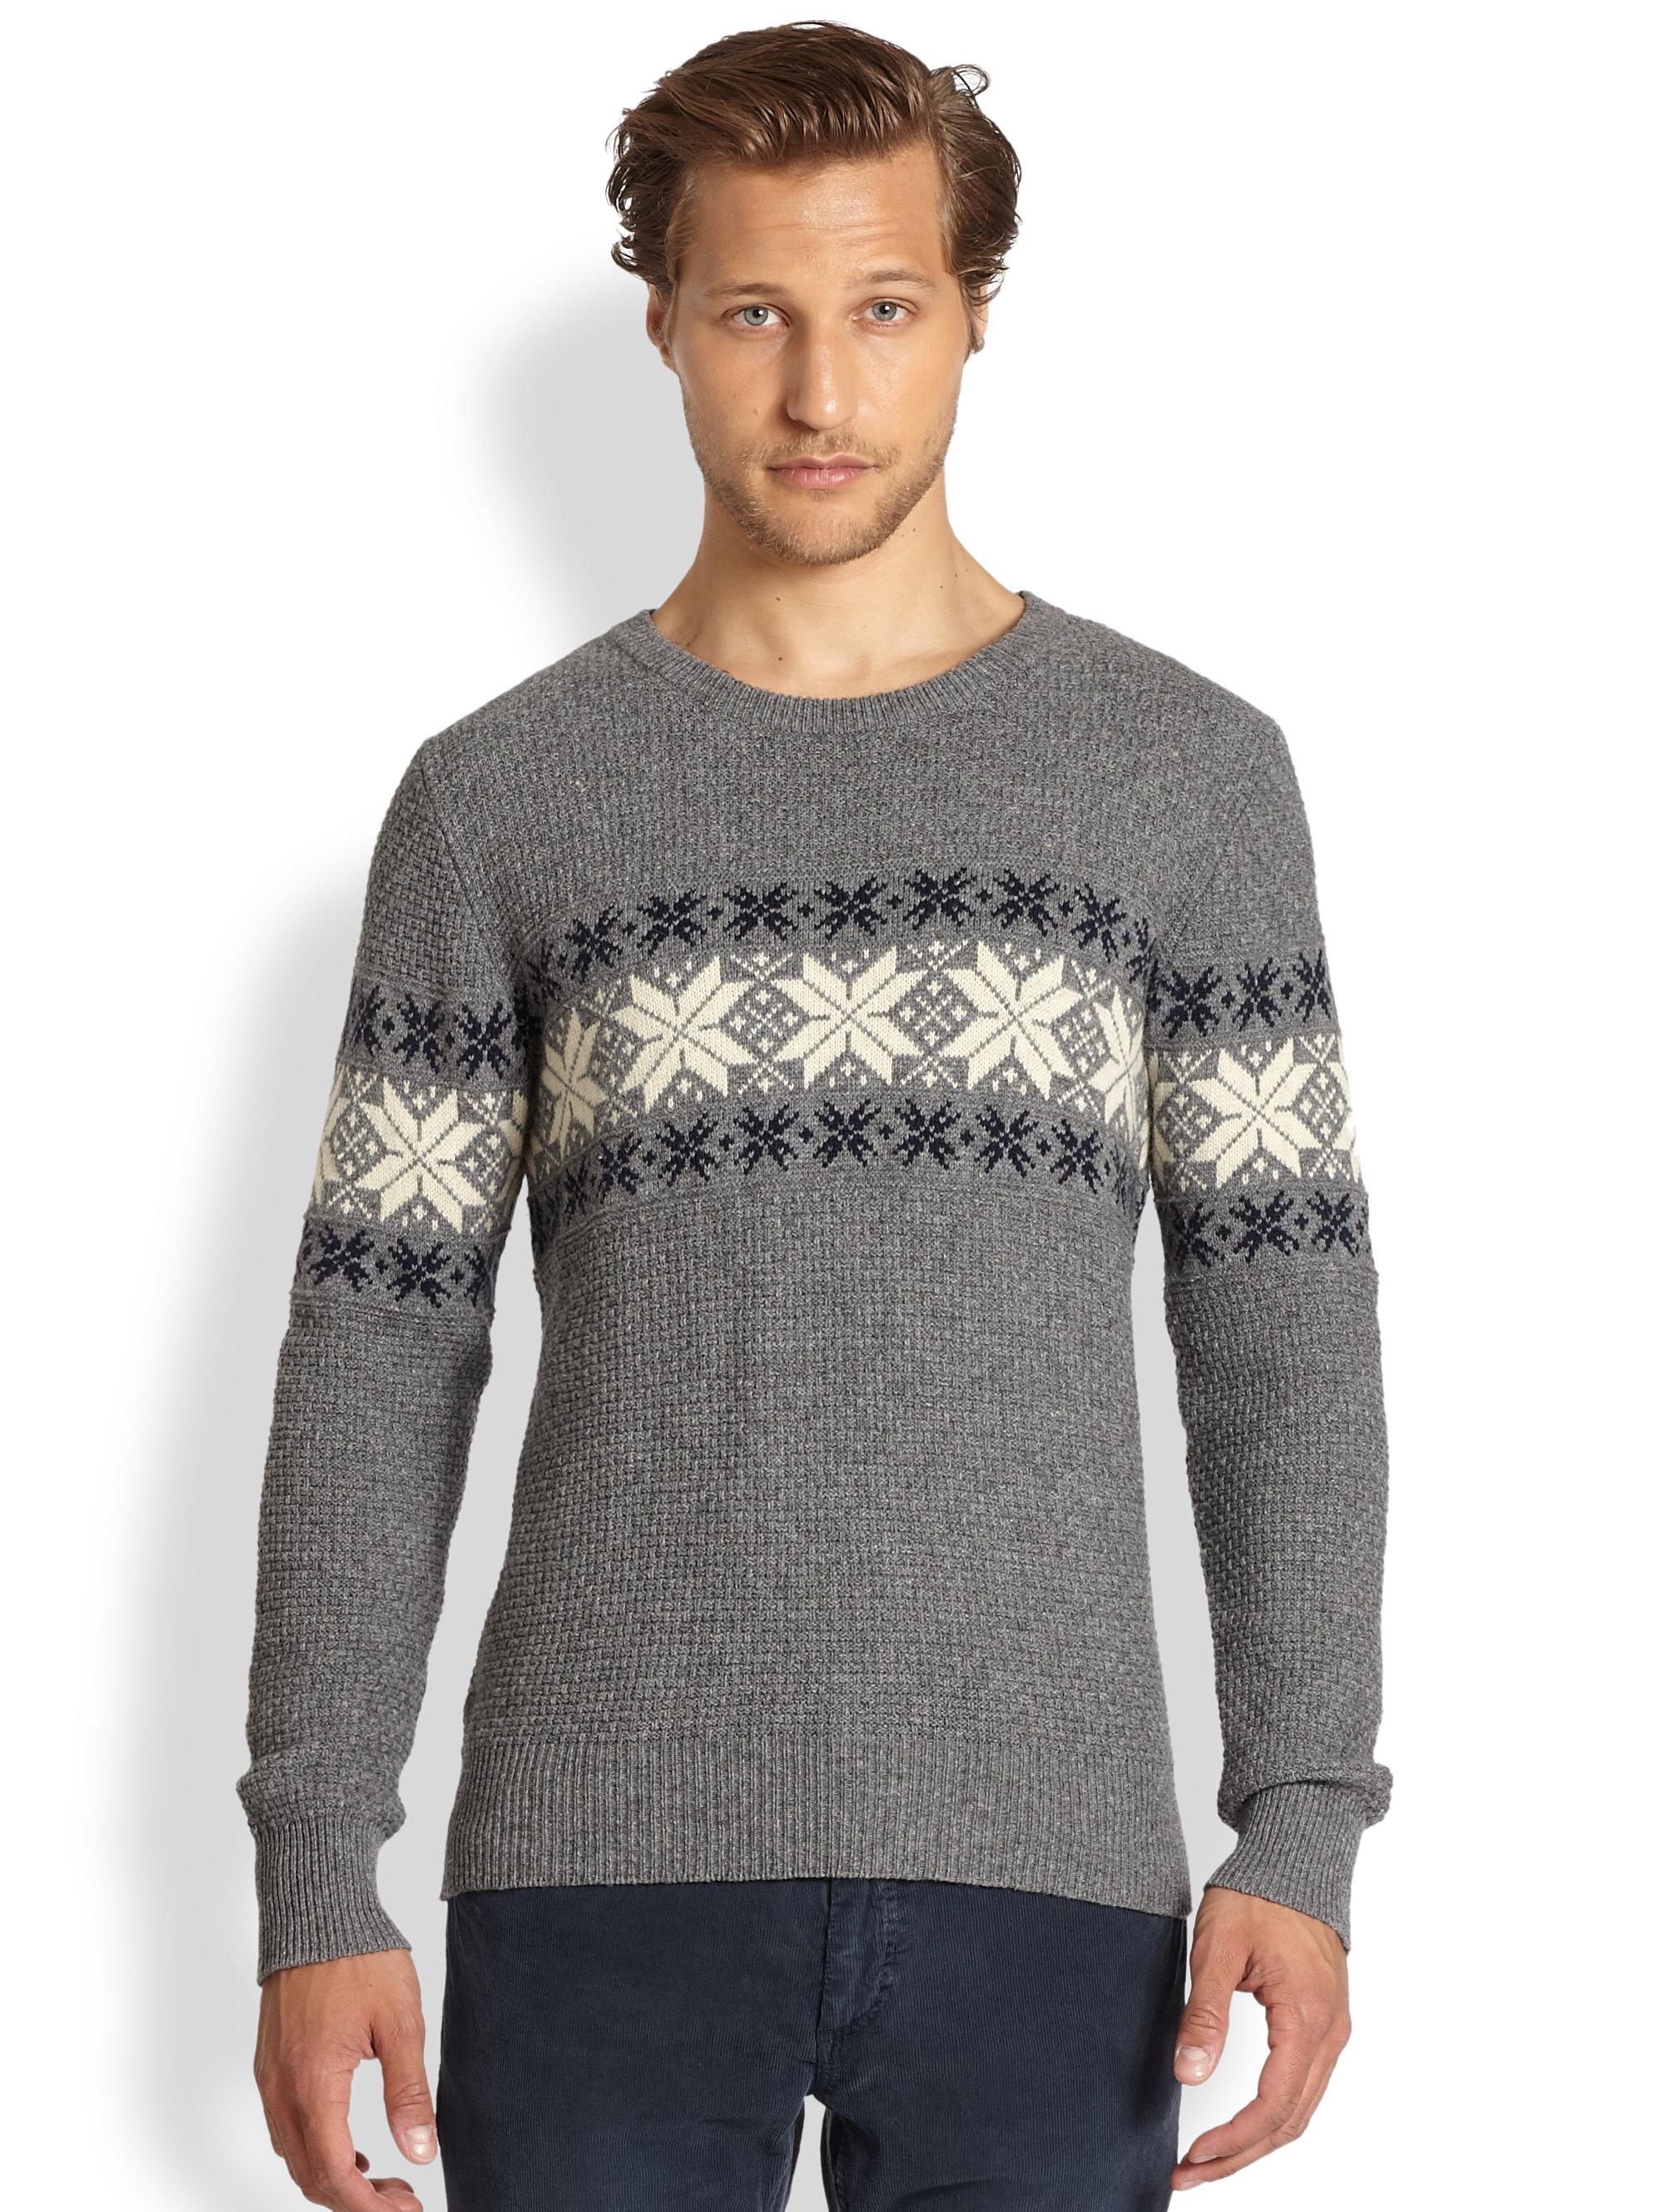 Gant rugger Fairisle Nordic Snowflake Sweater in Gray for Men | Lyst